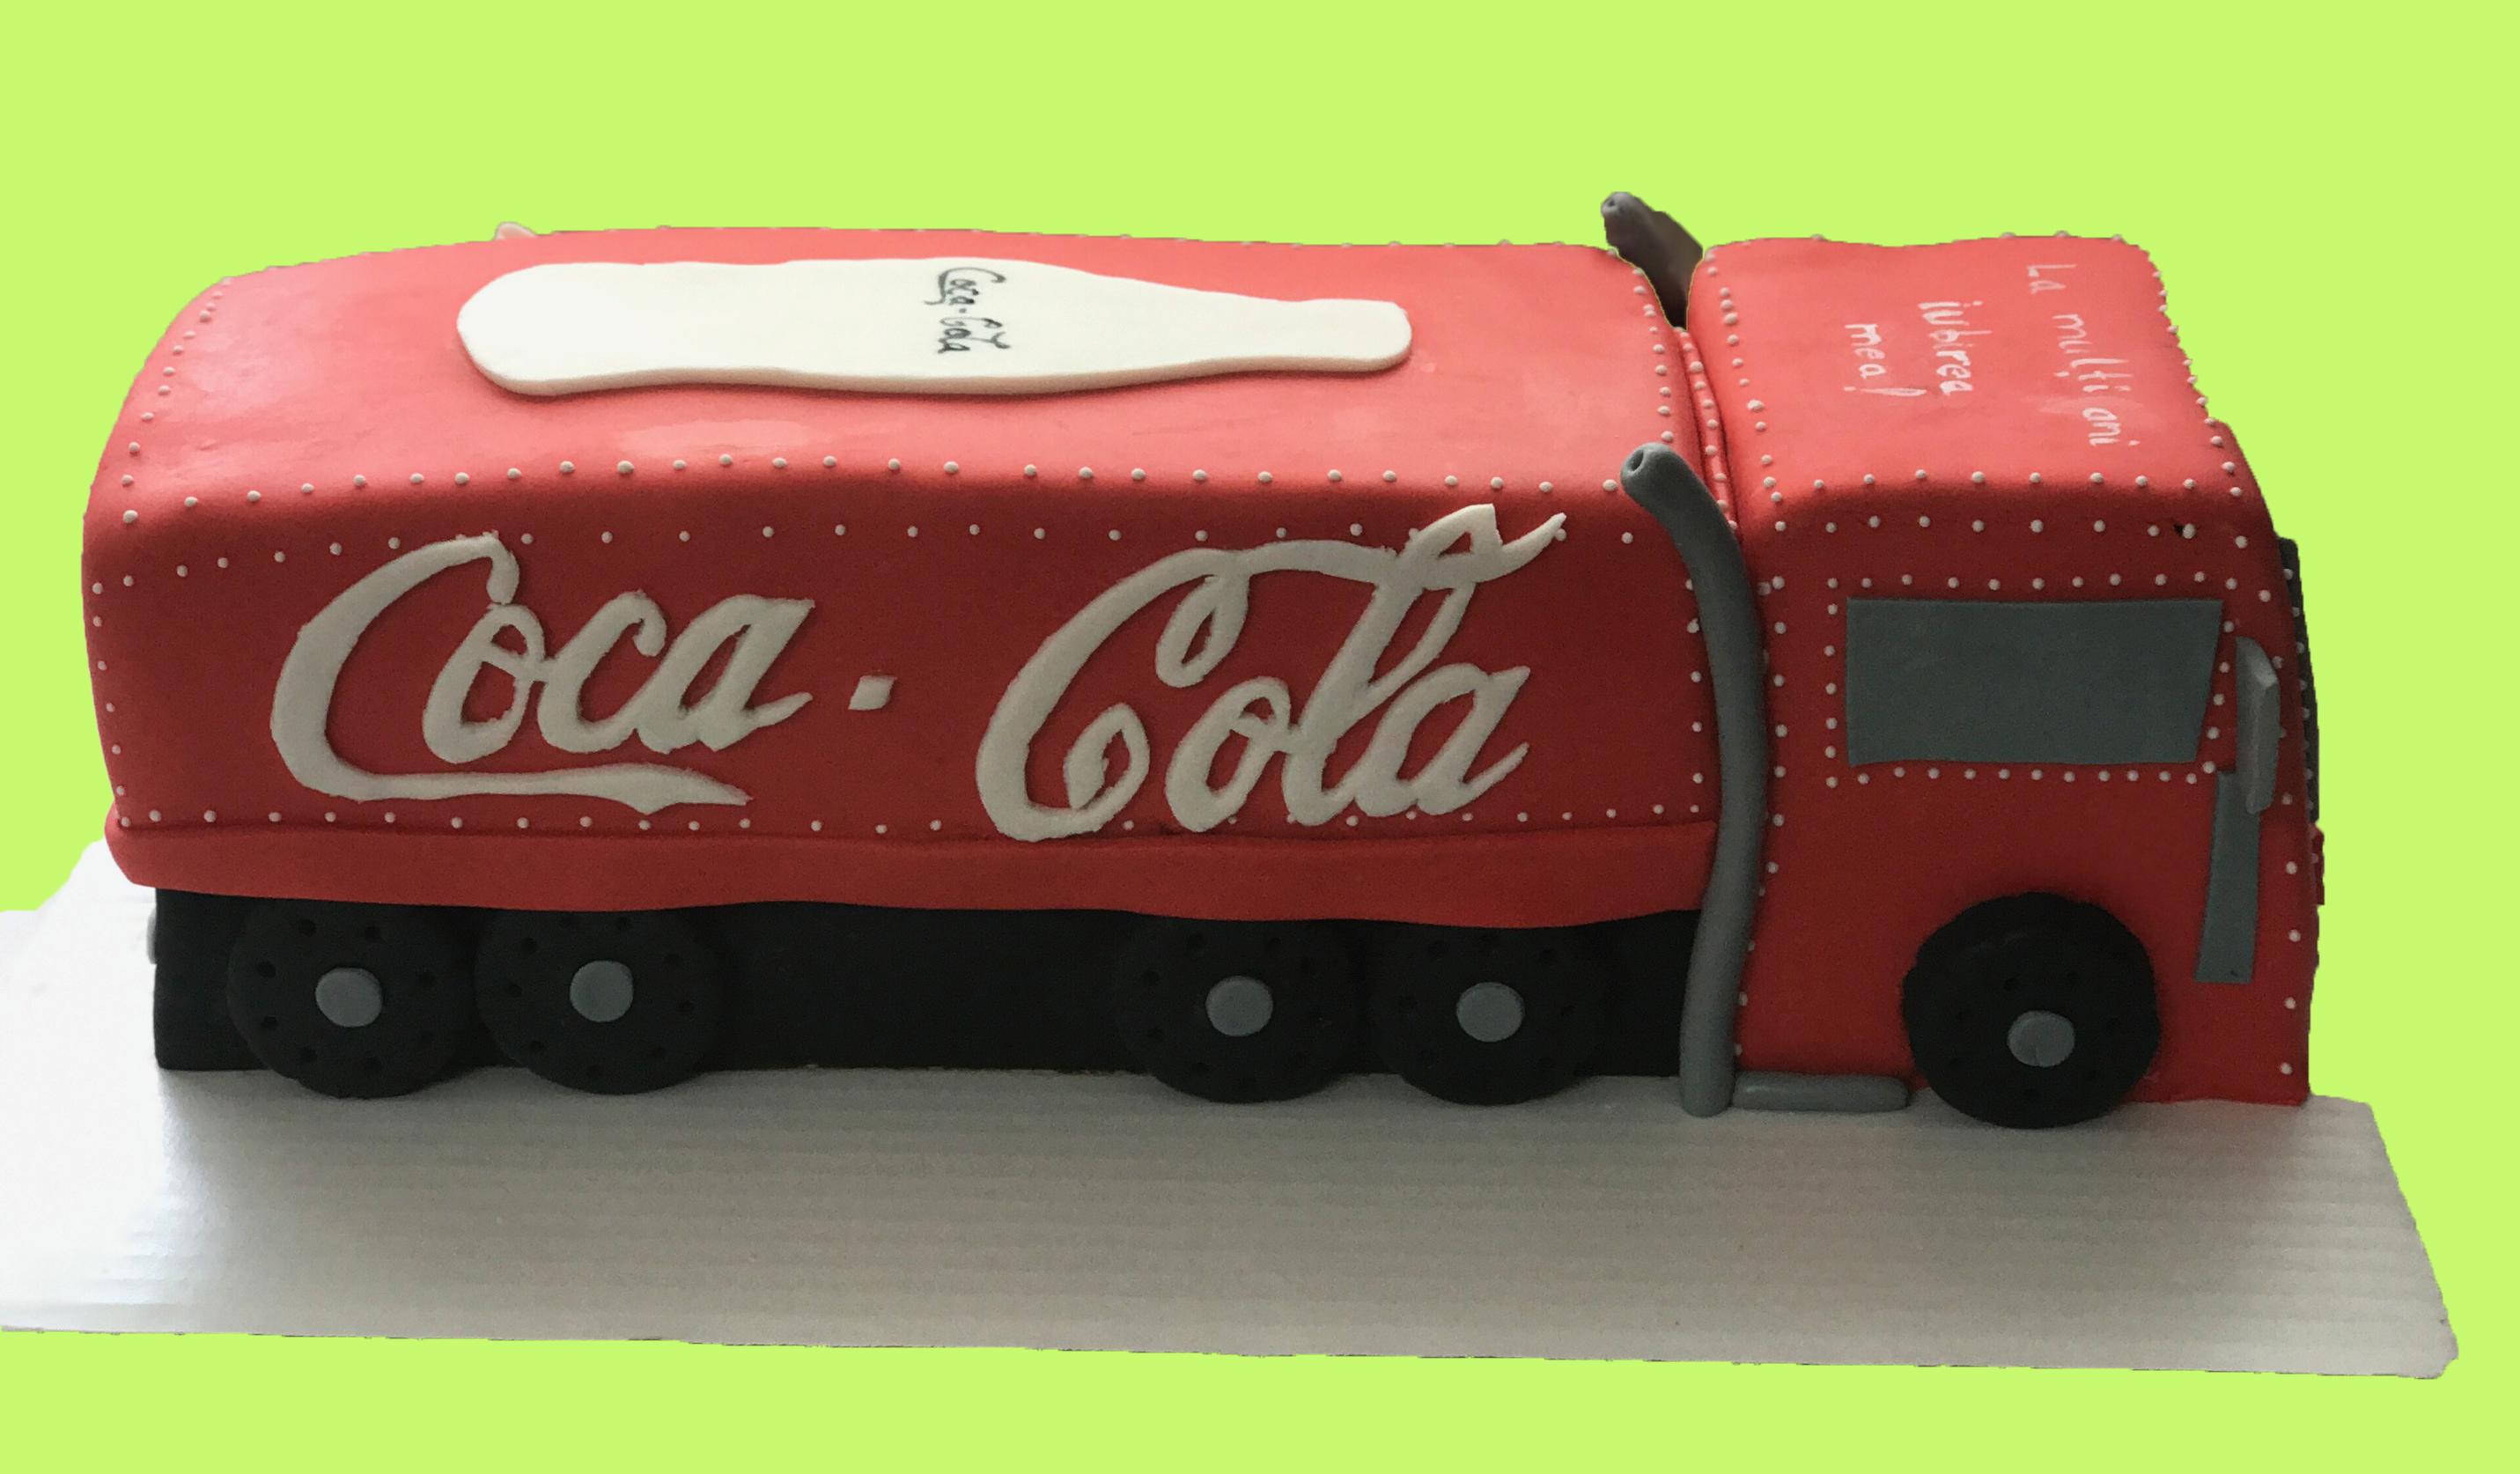 Coca- Cola cake